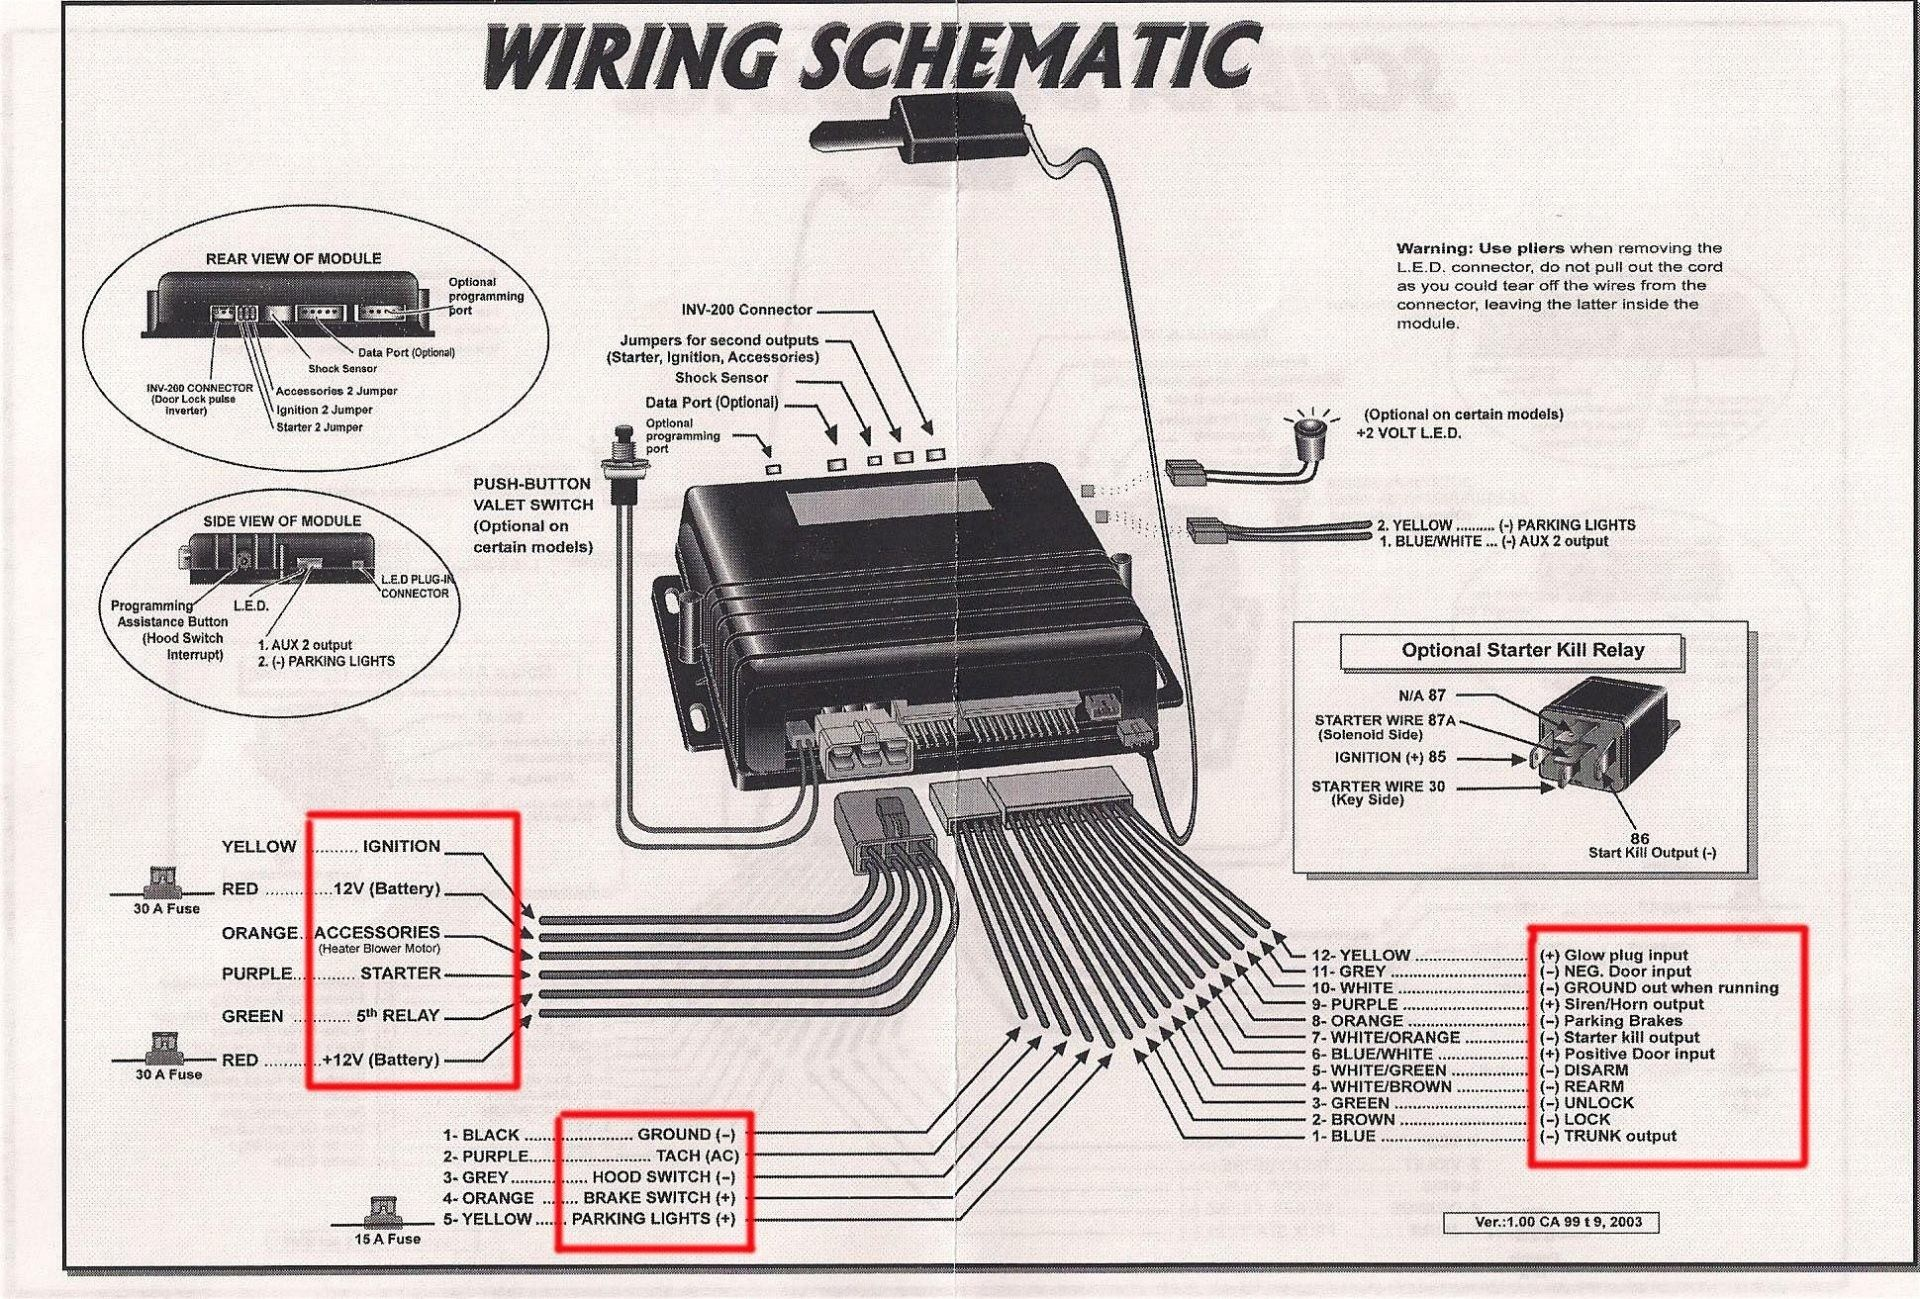 Viper alarm system wiring diagram million